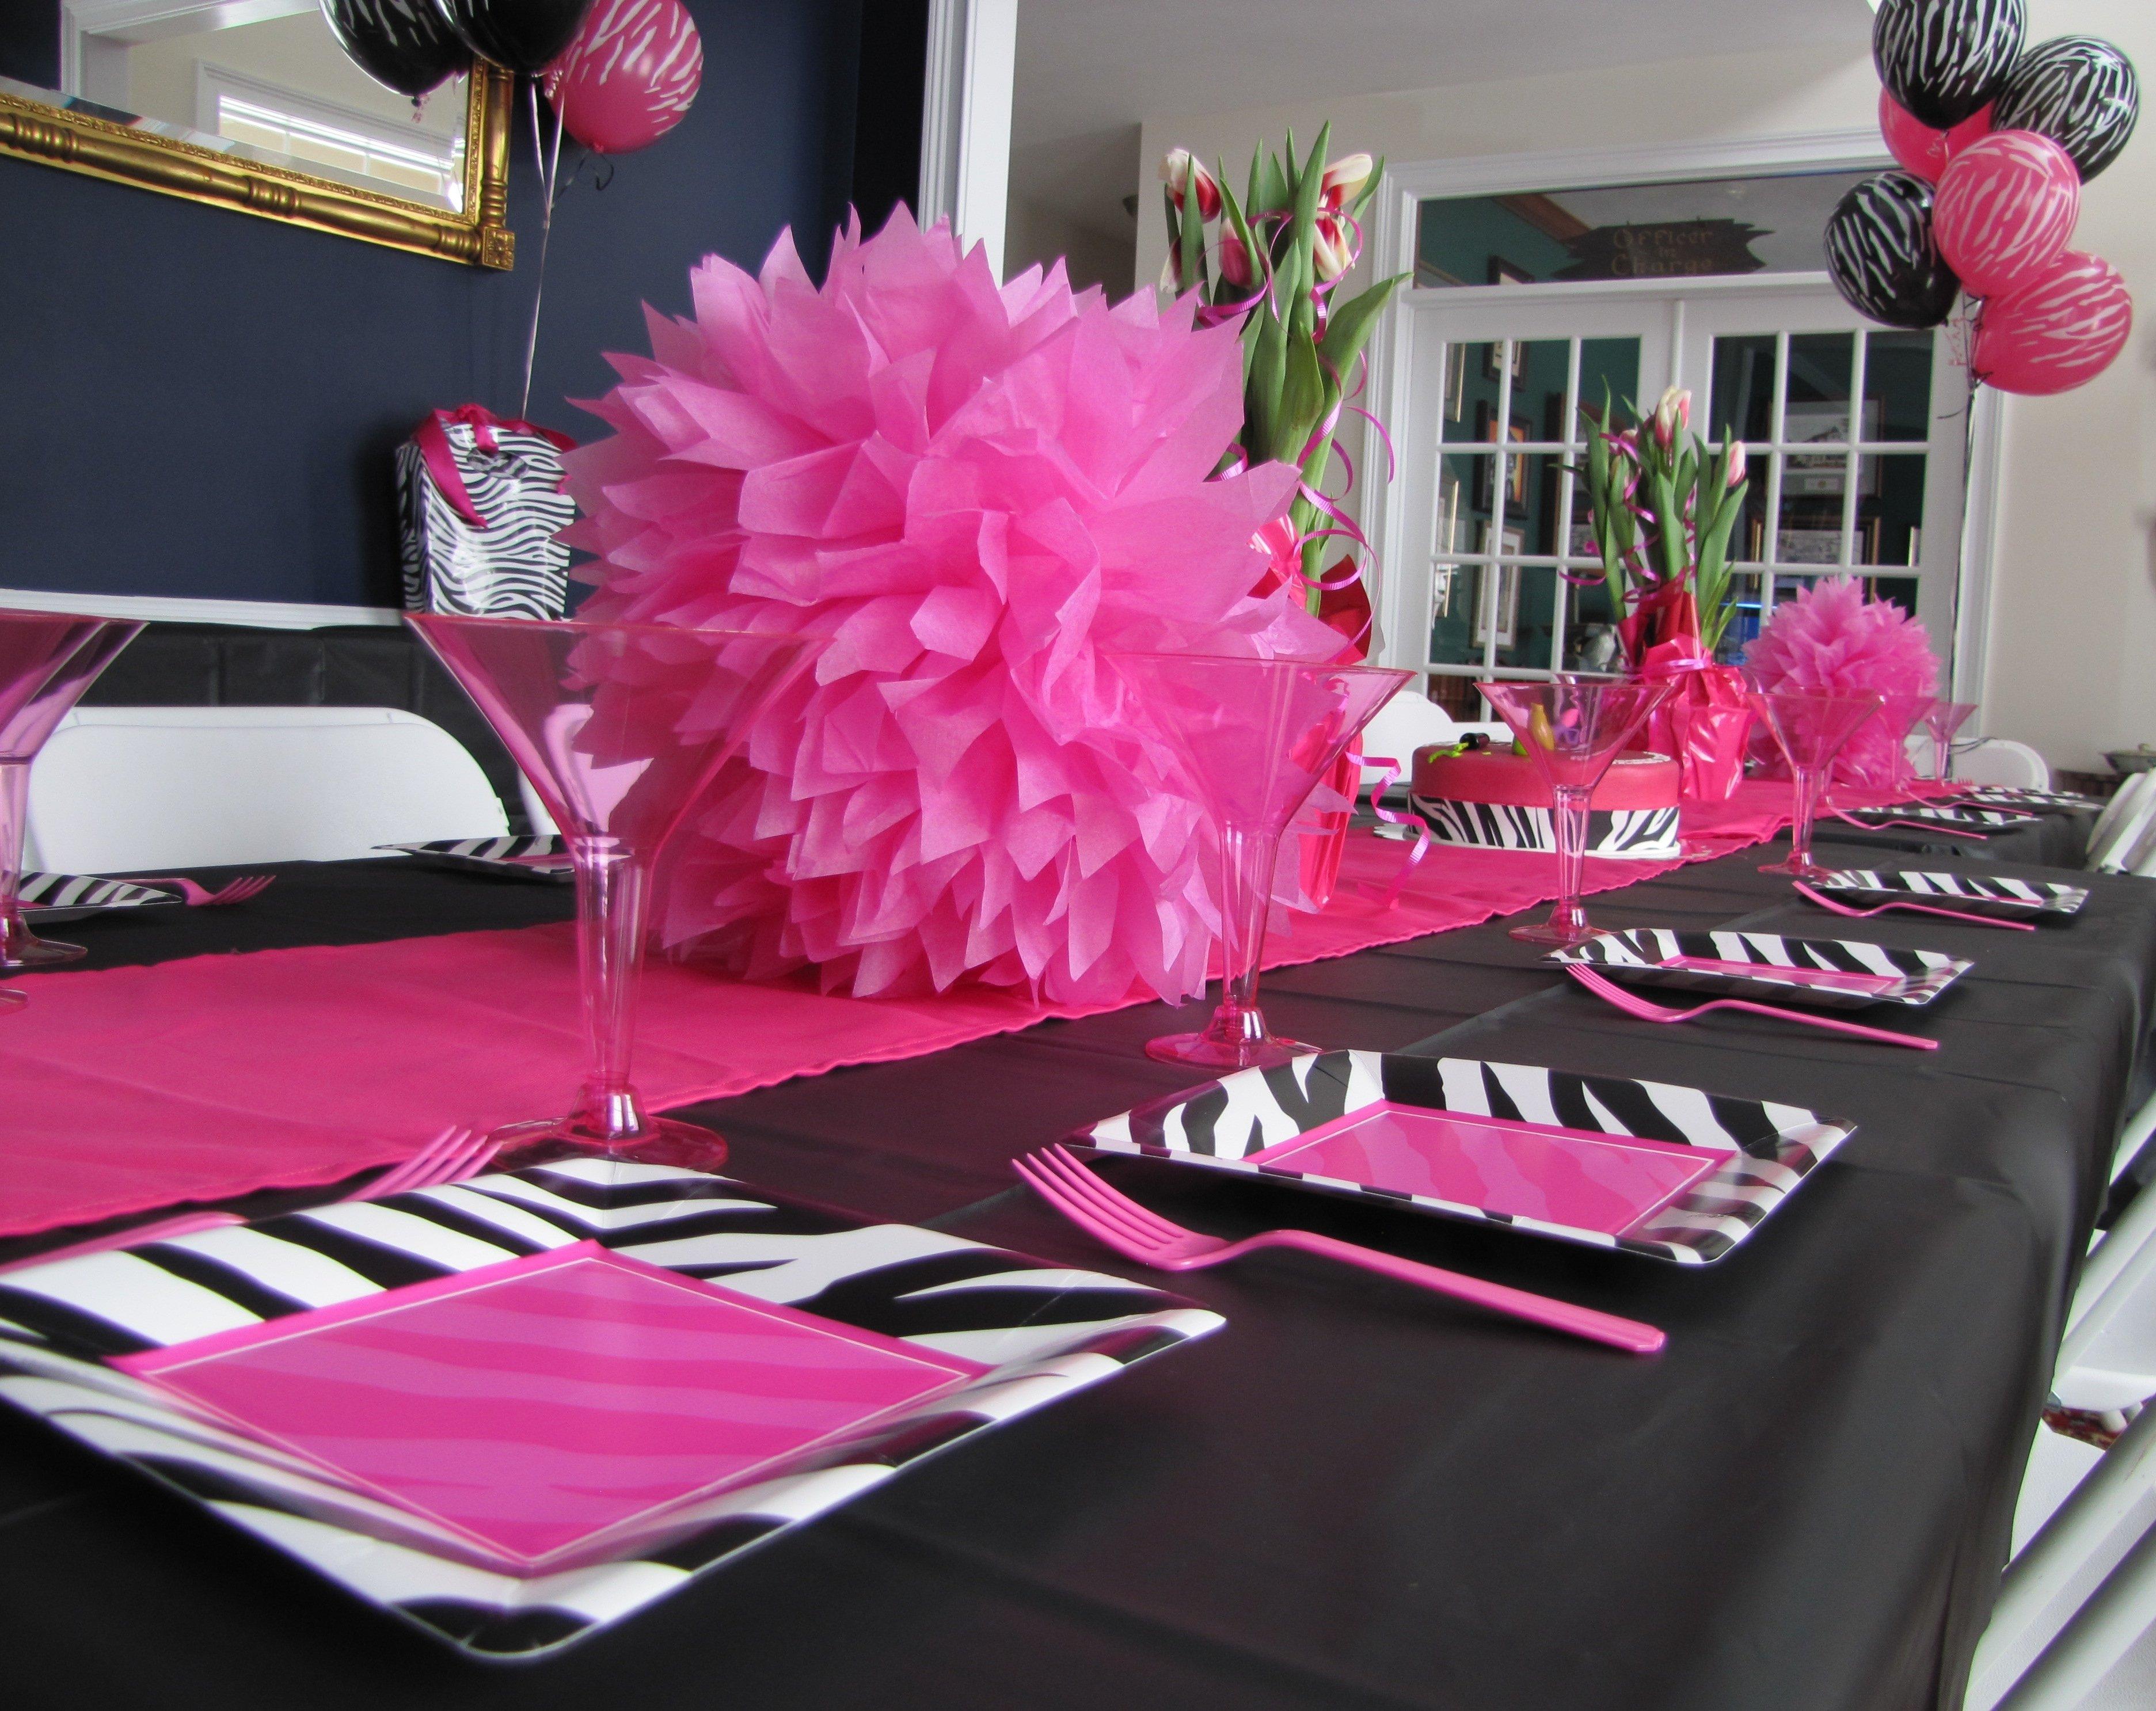 10 Spectacular Zebra Print Party Decoration Ideas zebra print party supplies and decorations zebra print party 2021